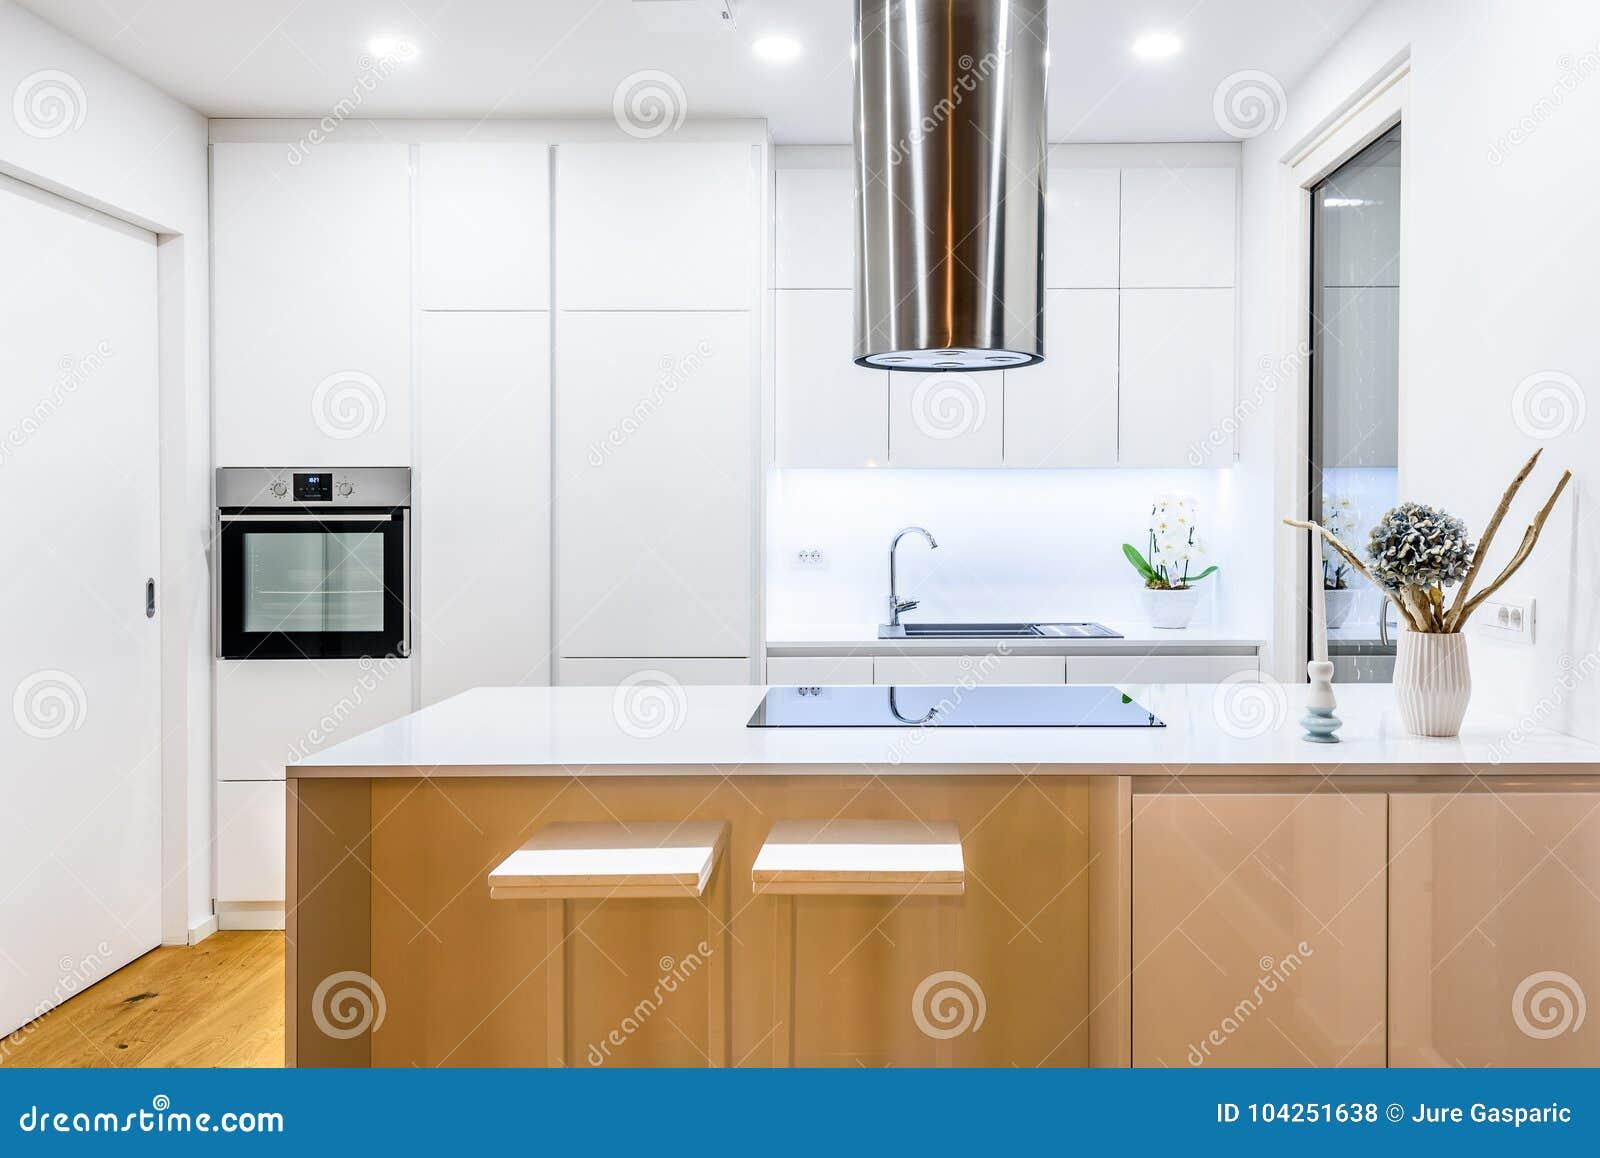 Binnenlandse ontwerp nieuwe moderne witte keuken met keukentoestellen